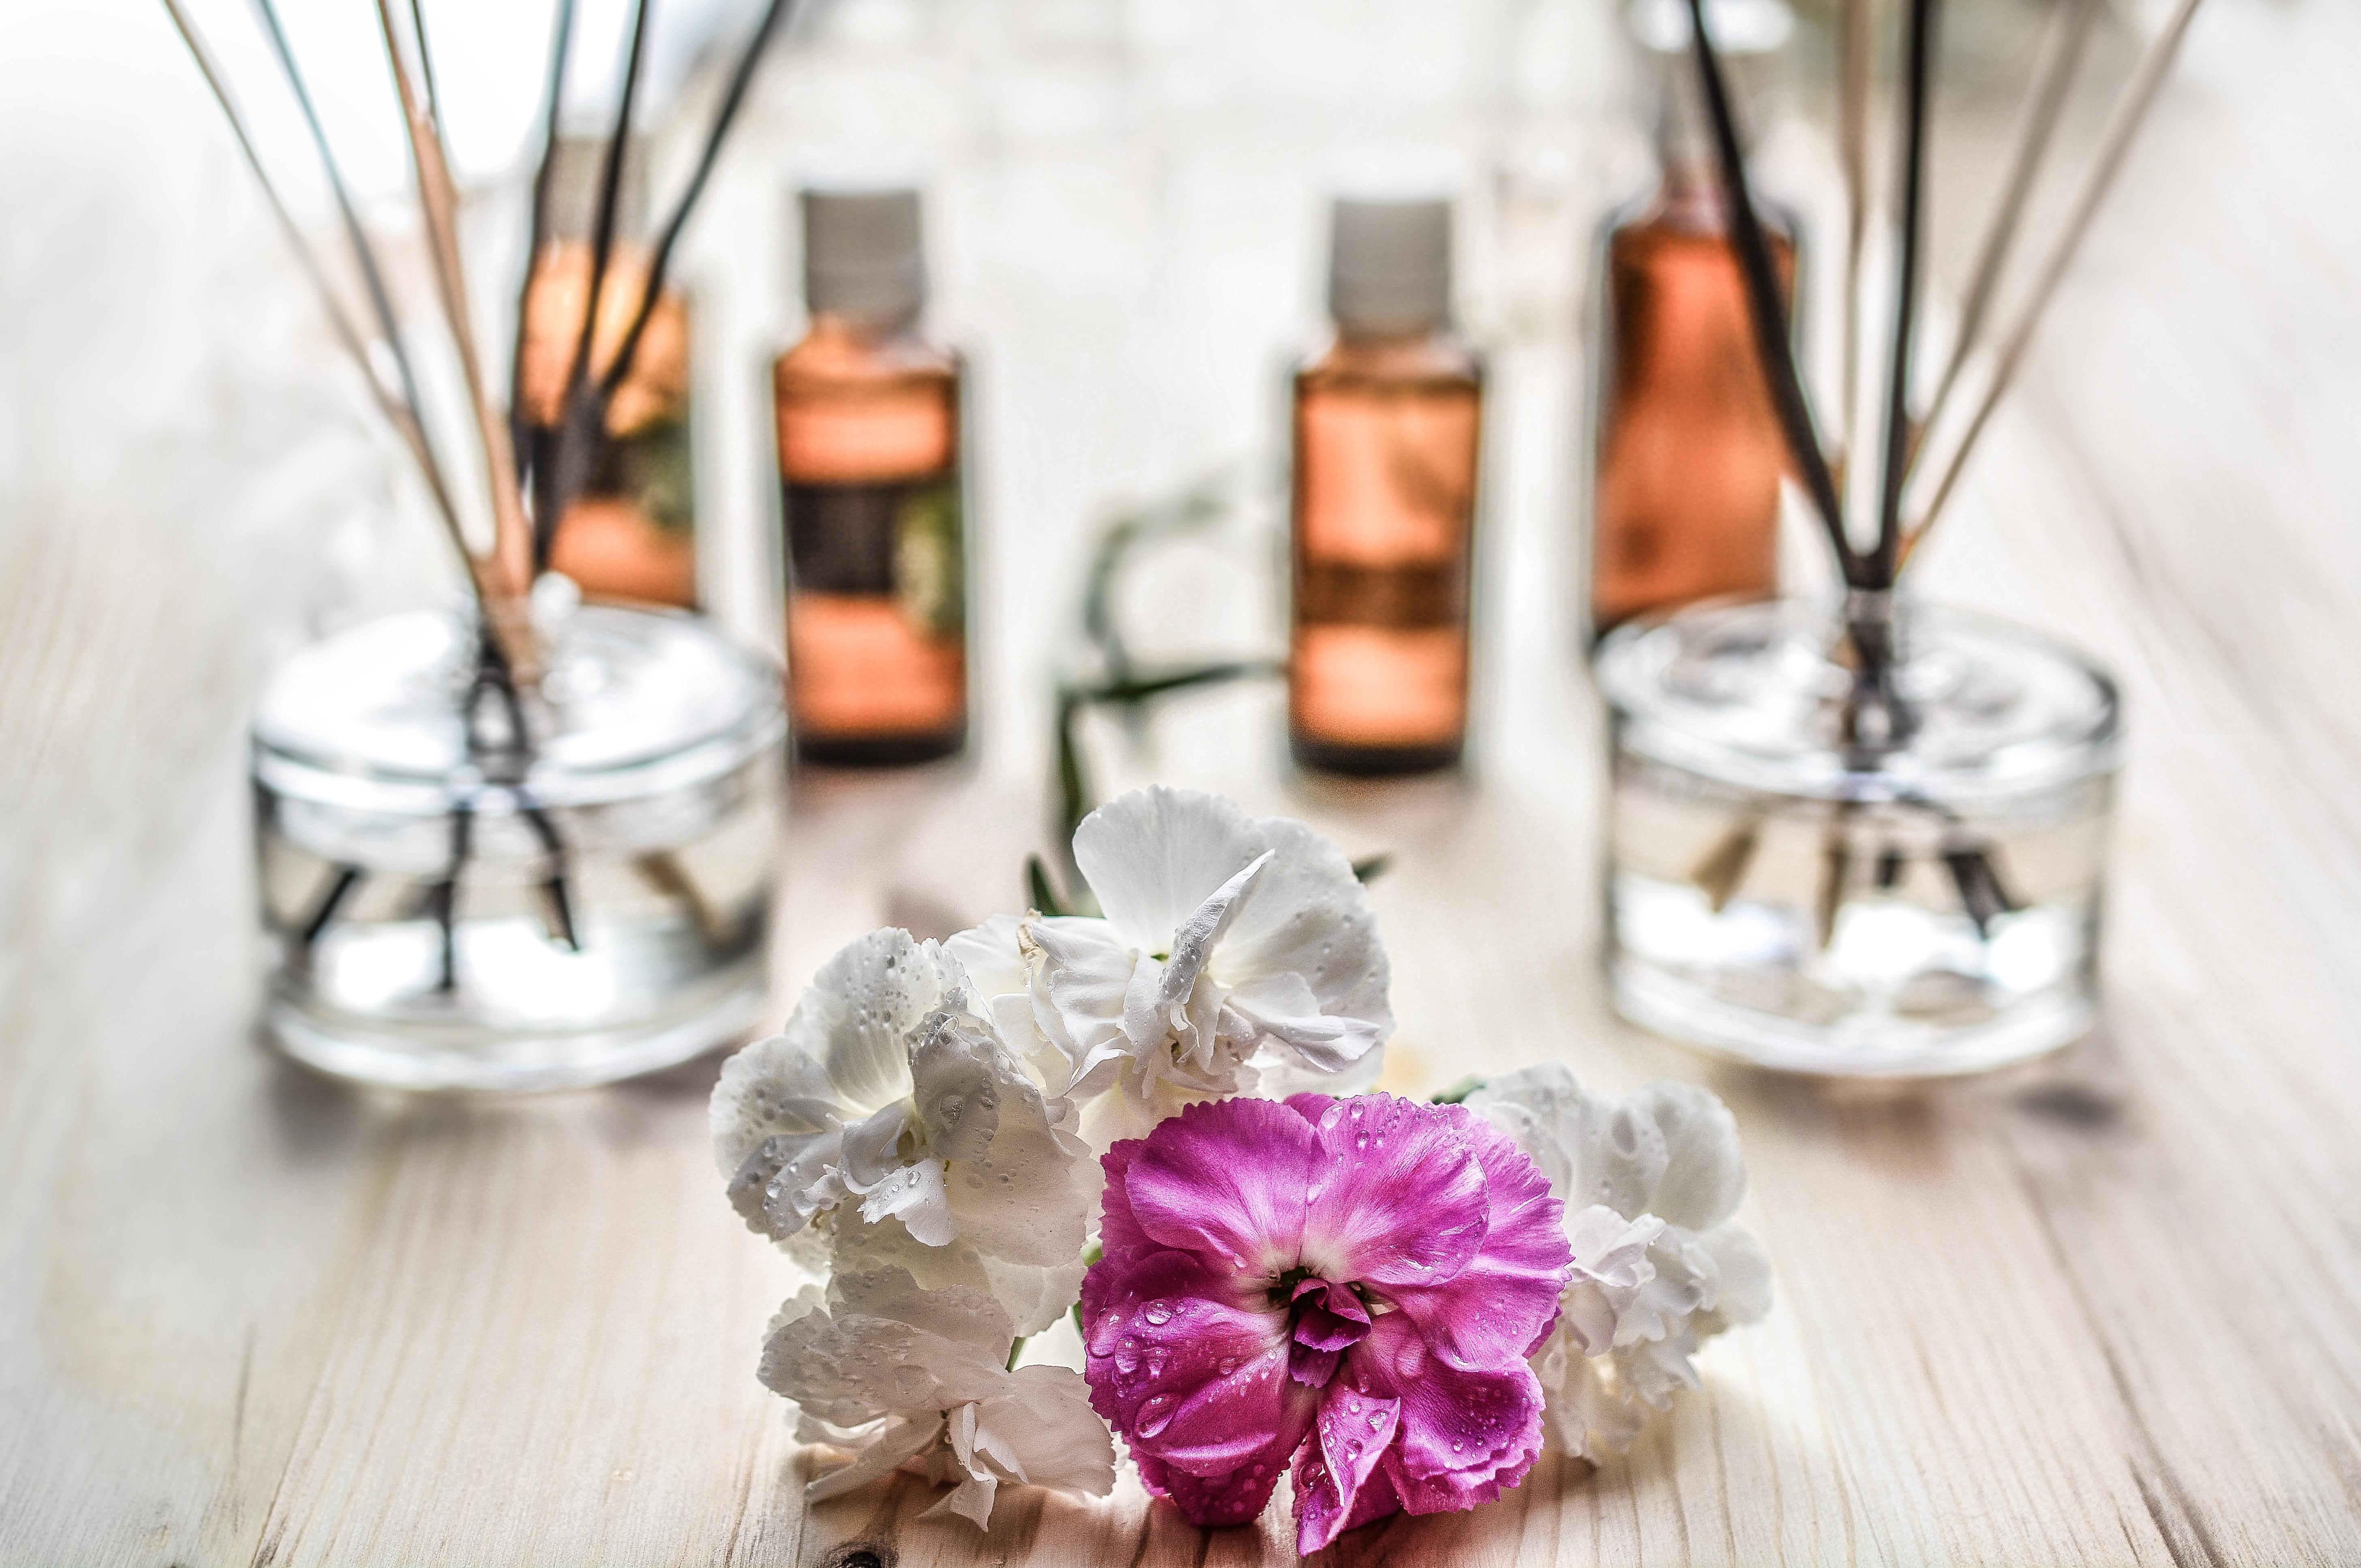 Aromatherapy diffusers help with sensory stimulation